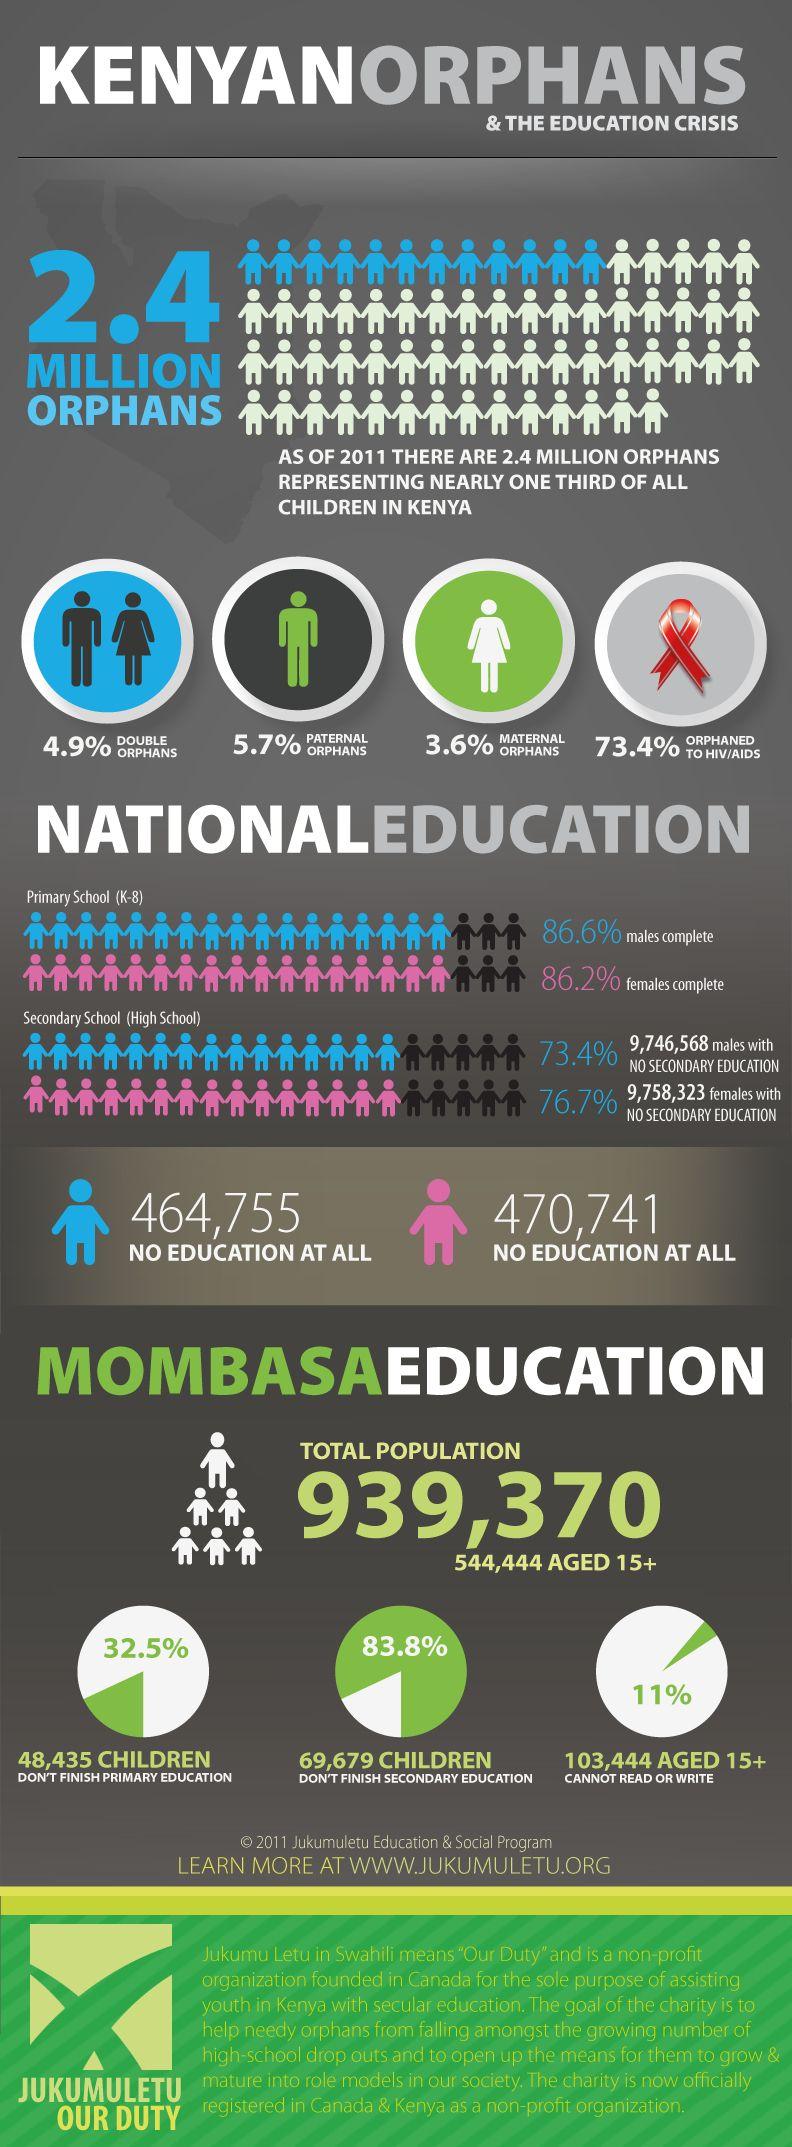 Kenya's Orphan & Education Crisis statistics by Canadian